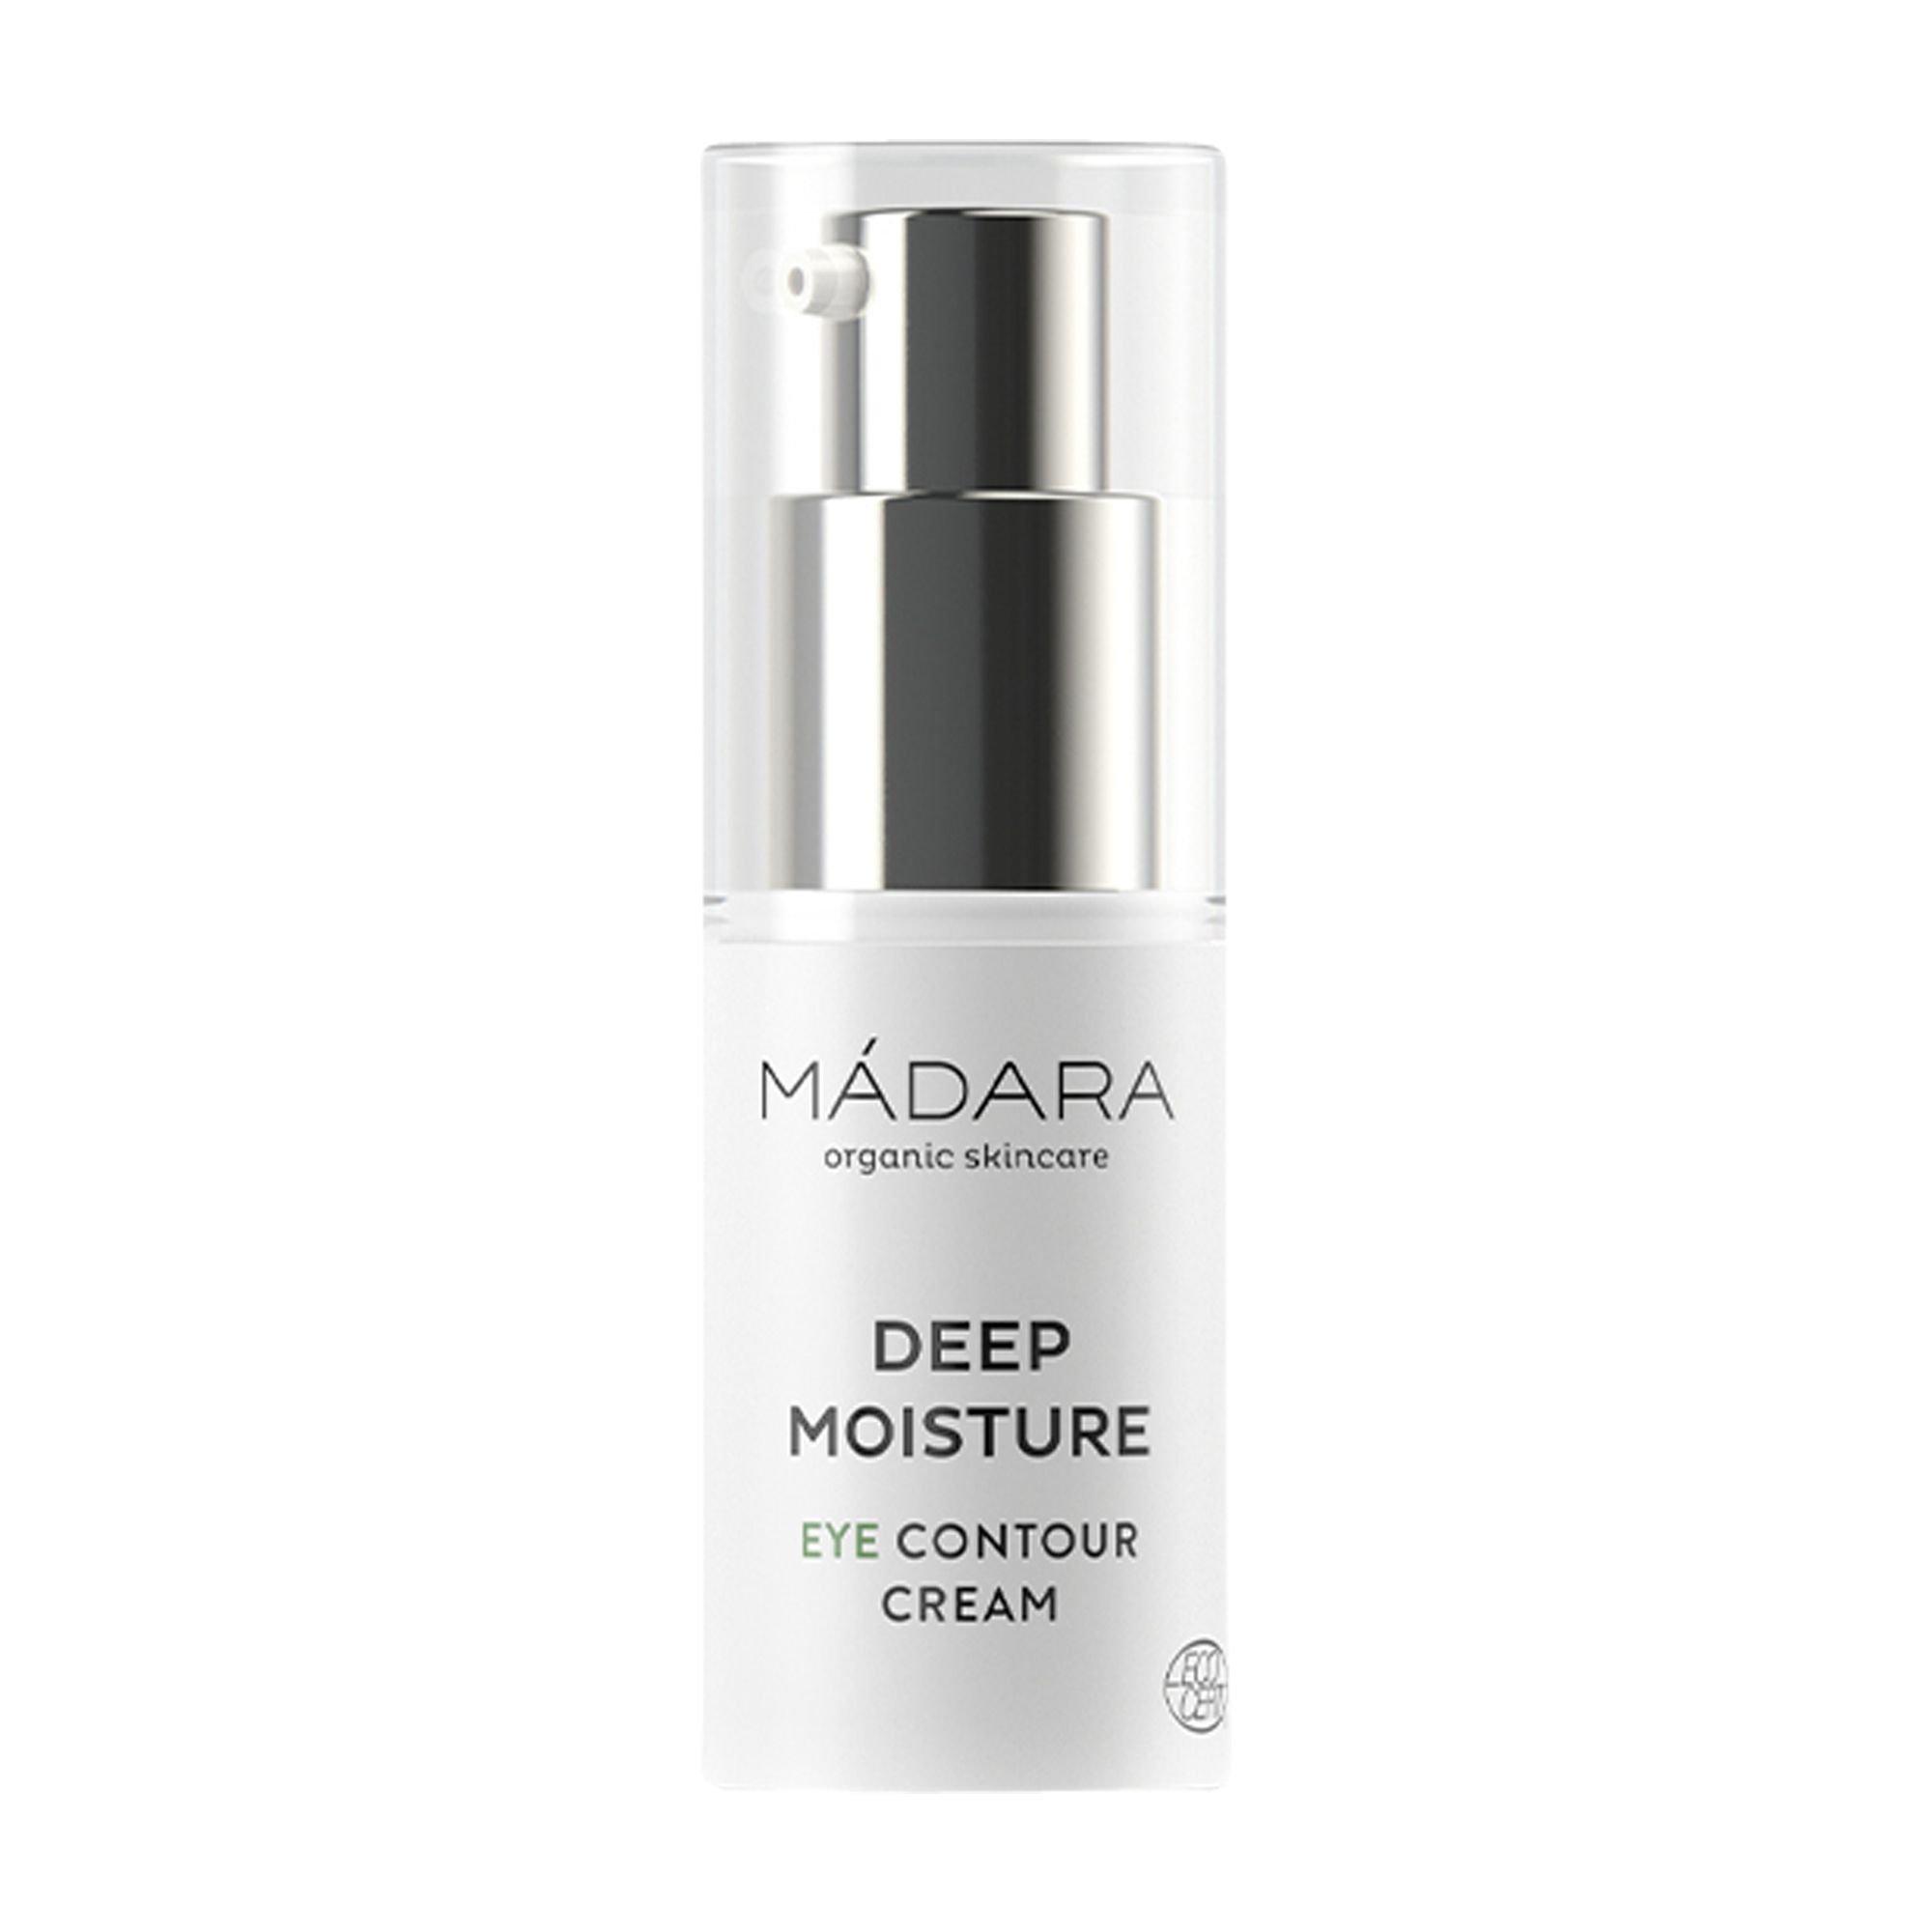 Mádara - Deep Moisture Eye Contour Cream 15 ml